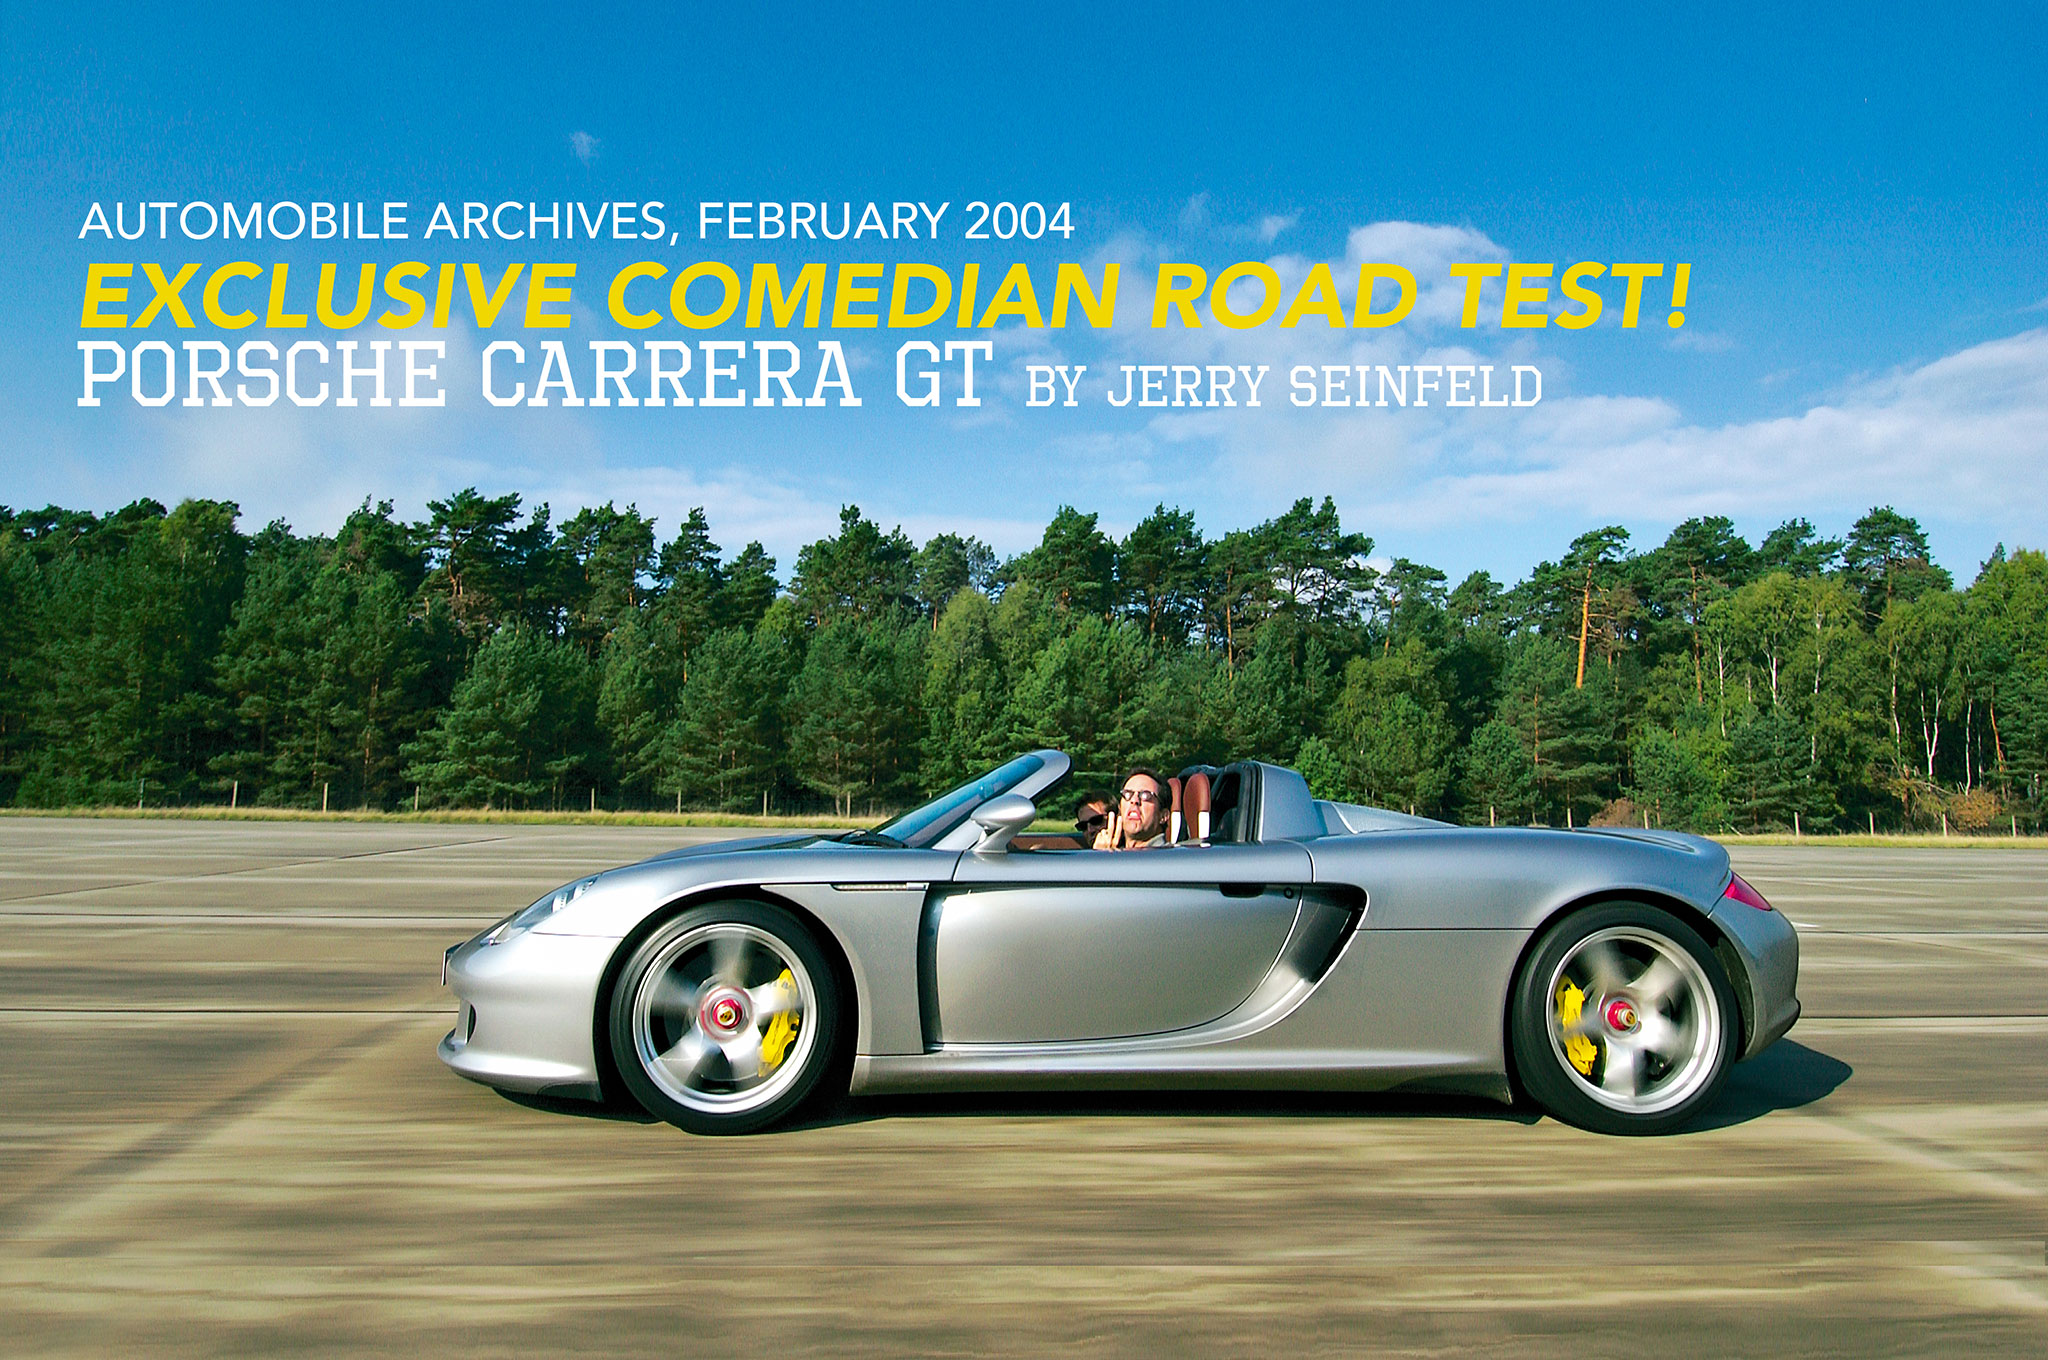 Jerry Seinfeld Porsche Carrera GT LEAD OPTION 1